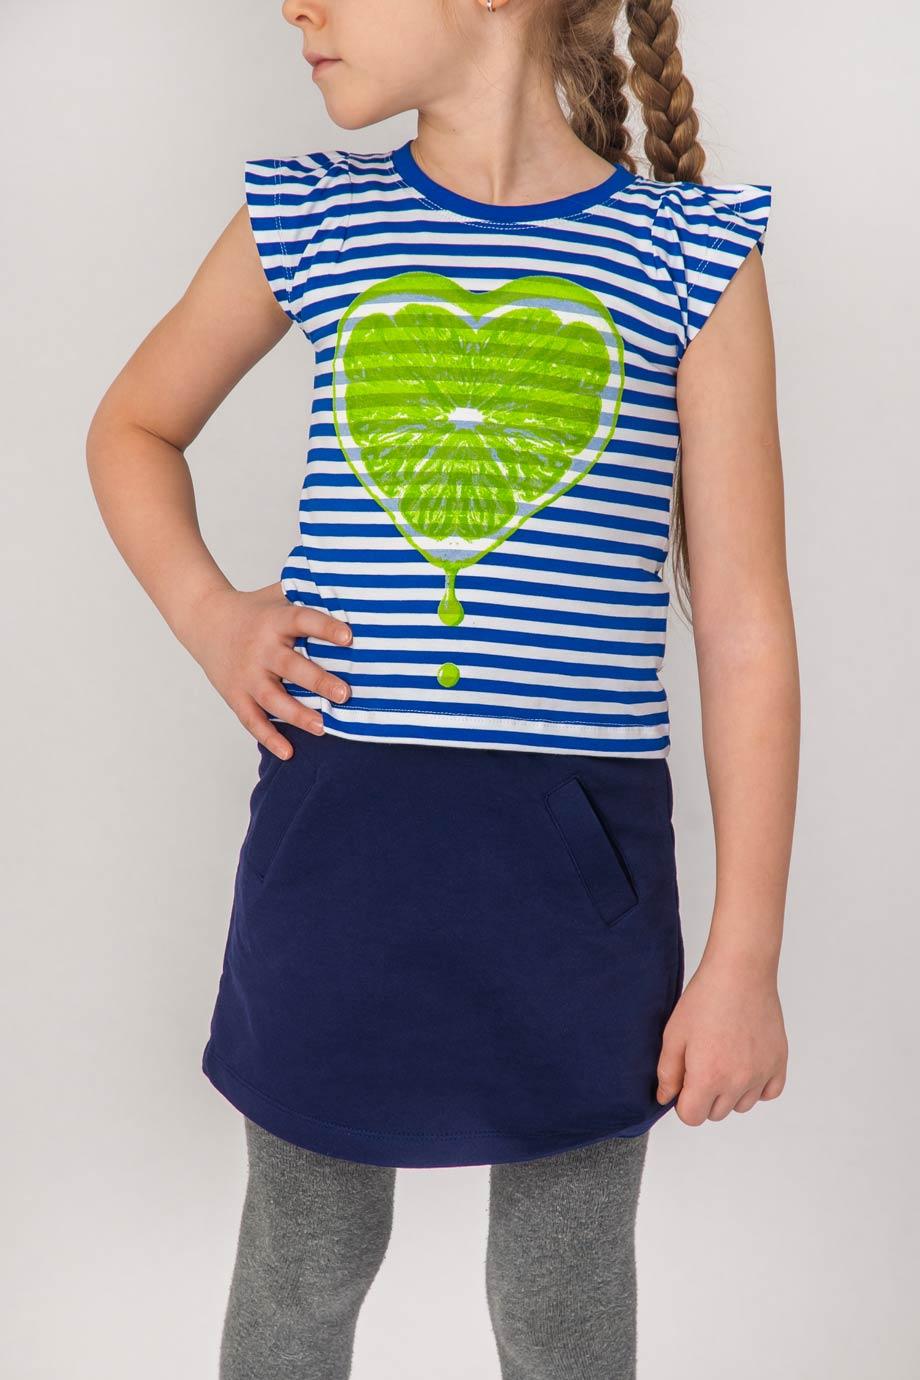 Майка для девочек Лайм с коротким рукавомКоллекция ВЕСНА-ЛЕТО<br><br><br>Размер: 110